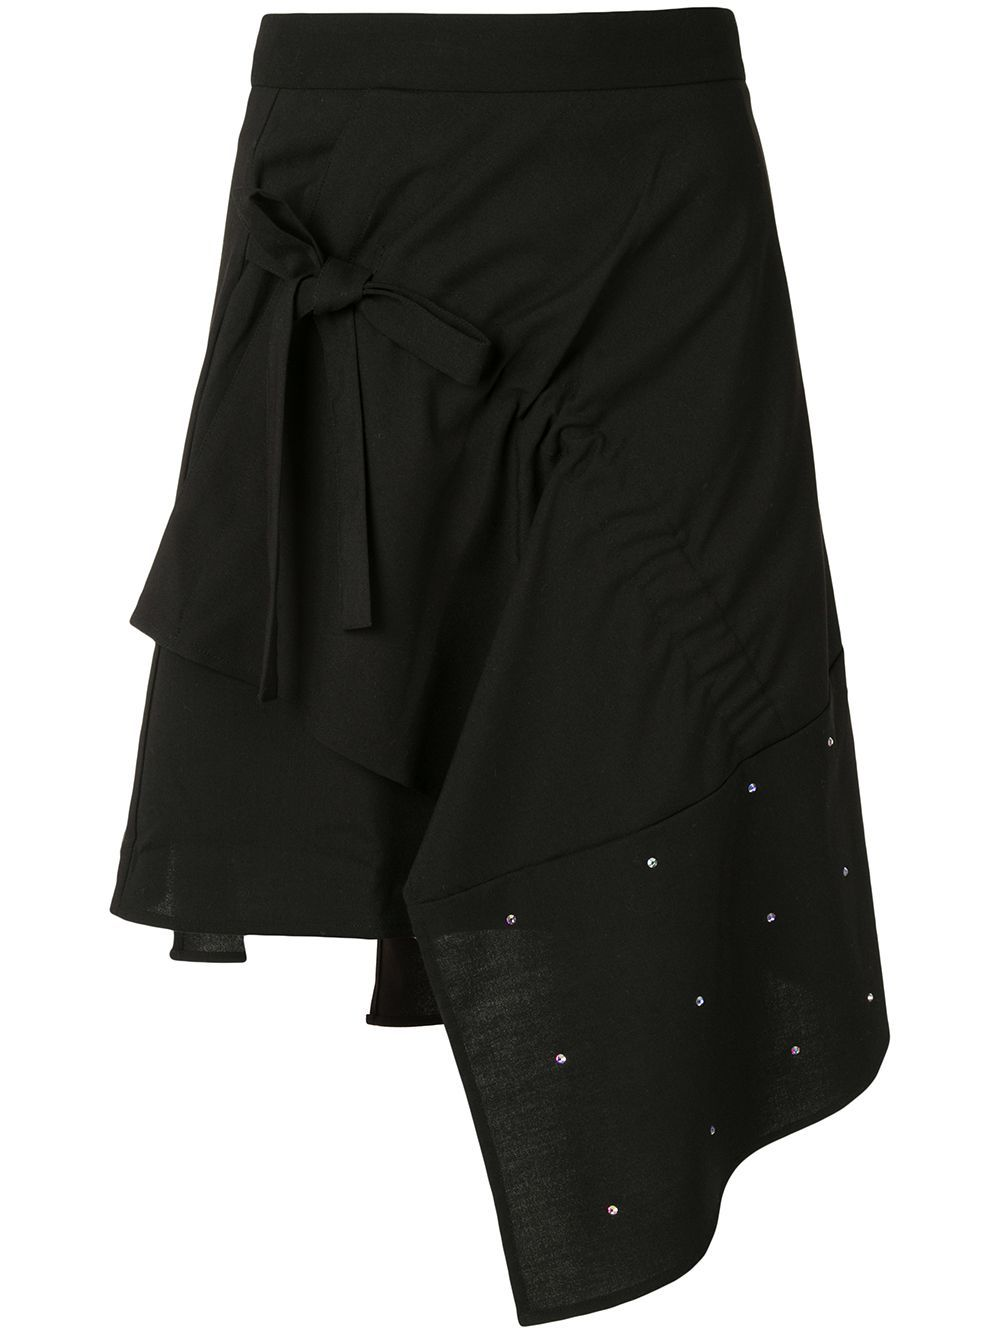 Midnight Walk In Paris~Upcycled Skirt,Asymmetrical Skirt